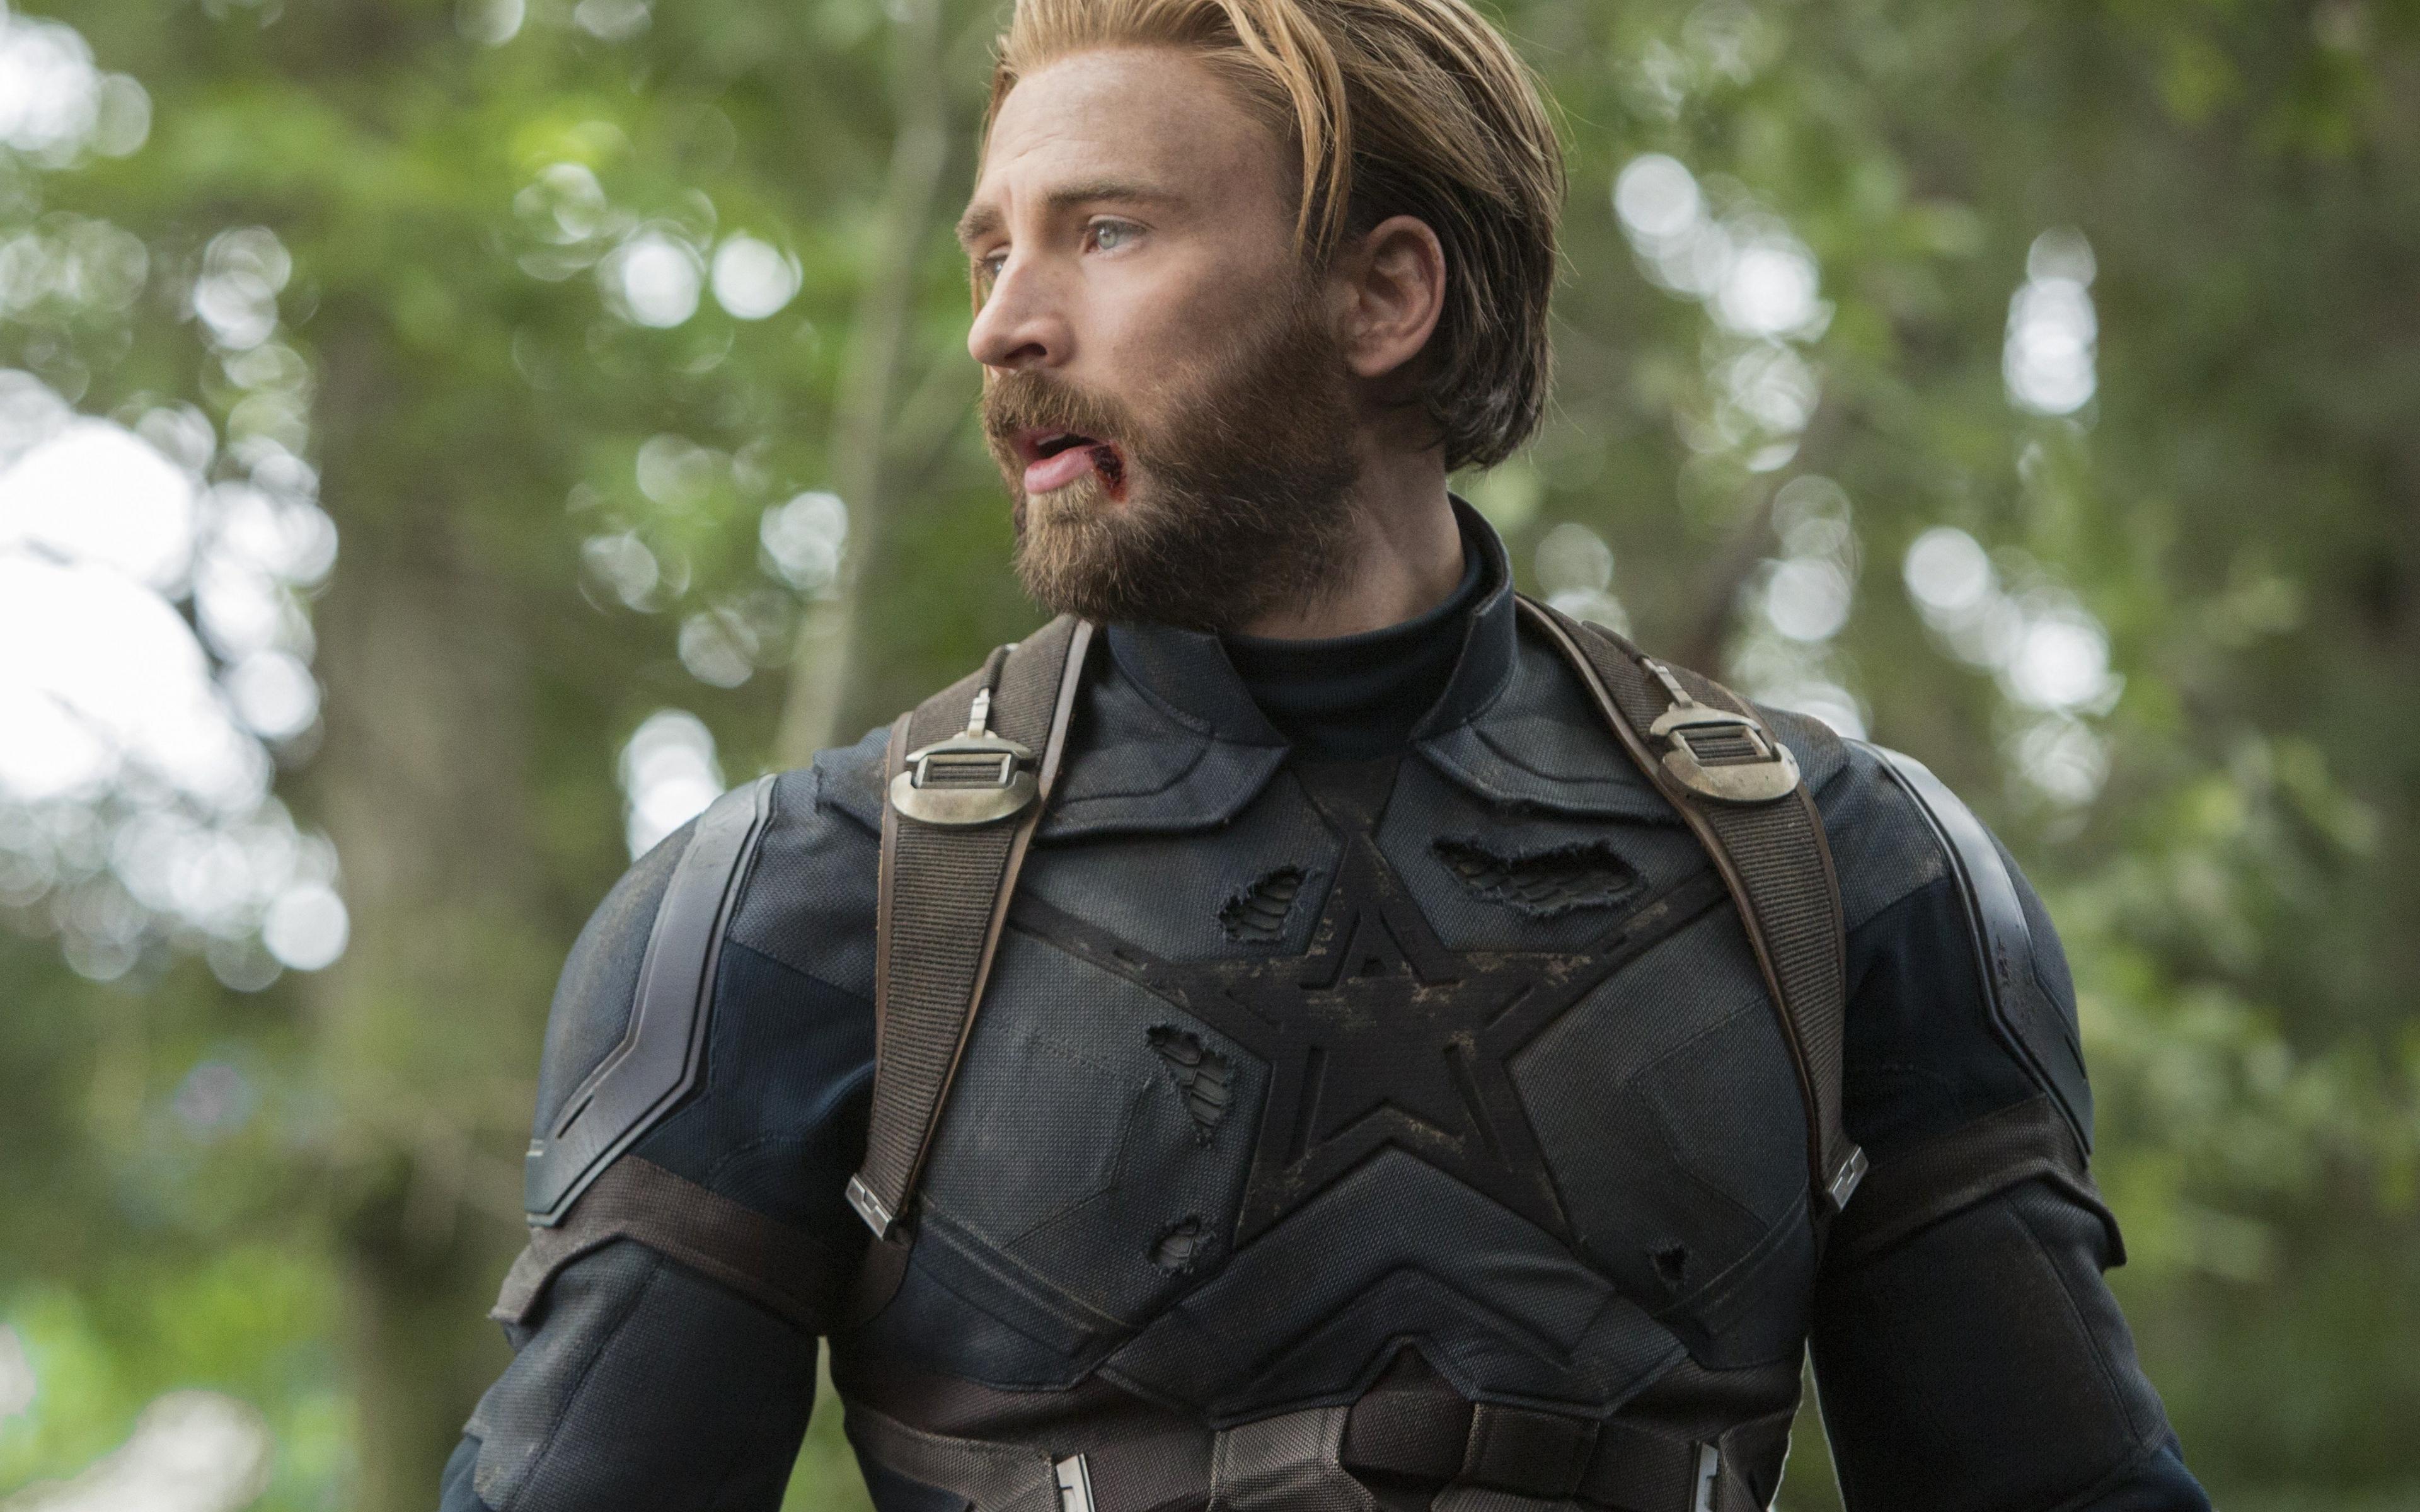 Download 3840x2400 Wallpaper Captain America Chris Evans Avengers